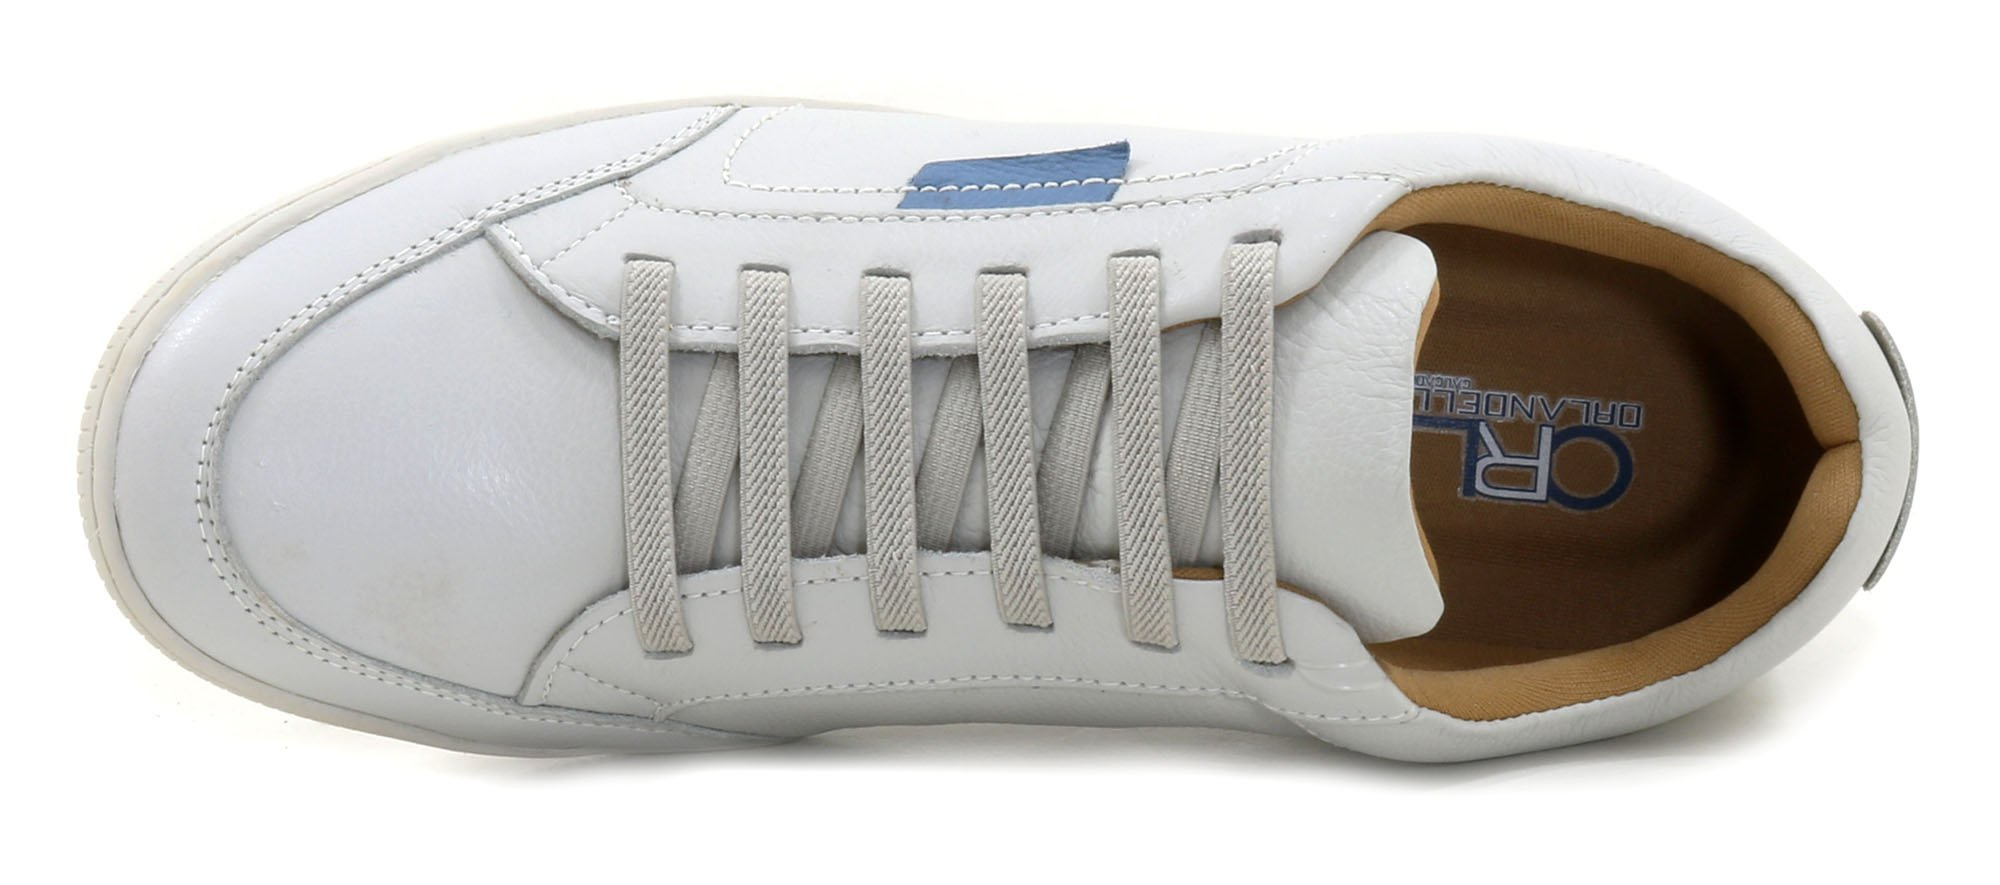 6307f83299 Kit 2 pares Sapatenis Masculino Casual Orlandelli 27091 - Sapatos de ...